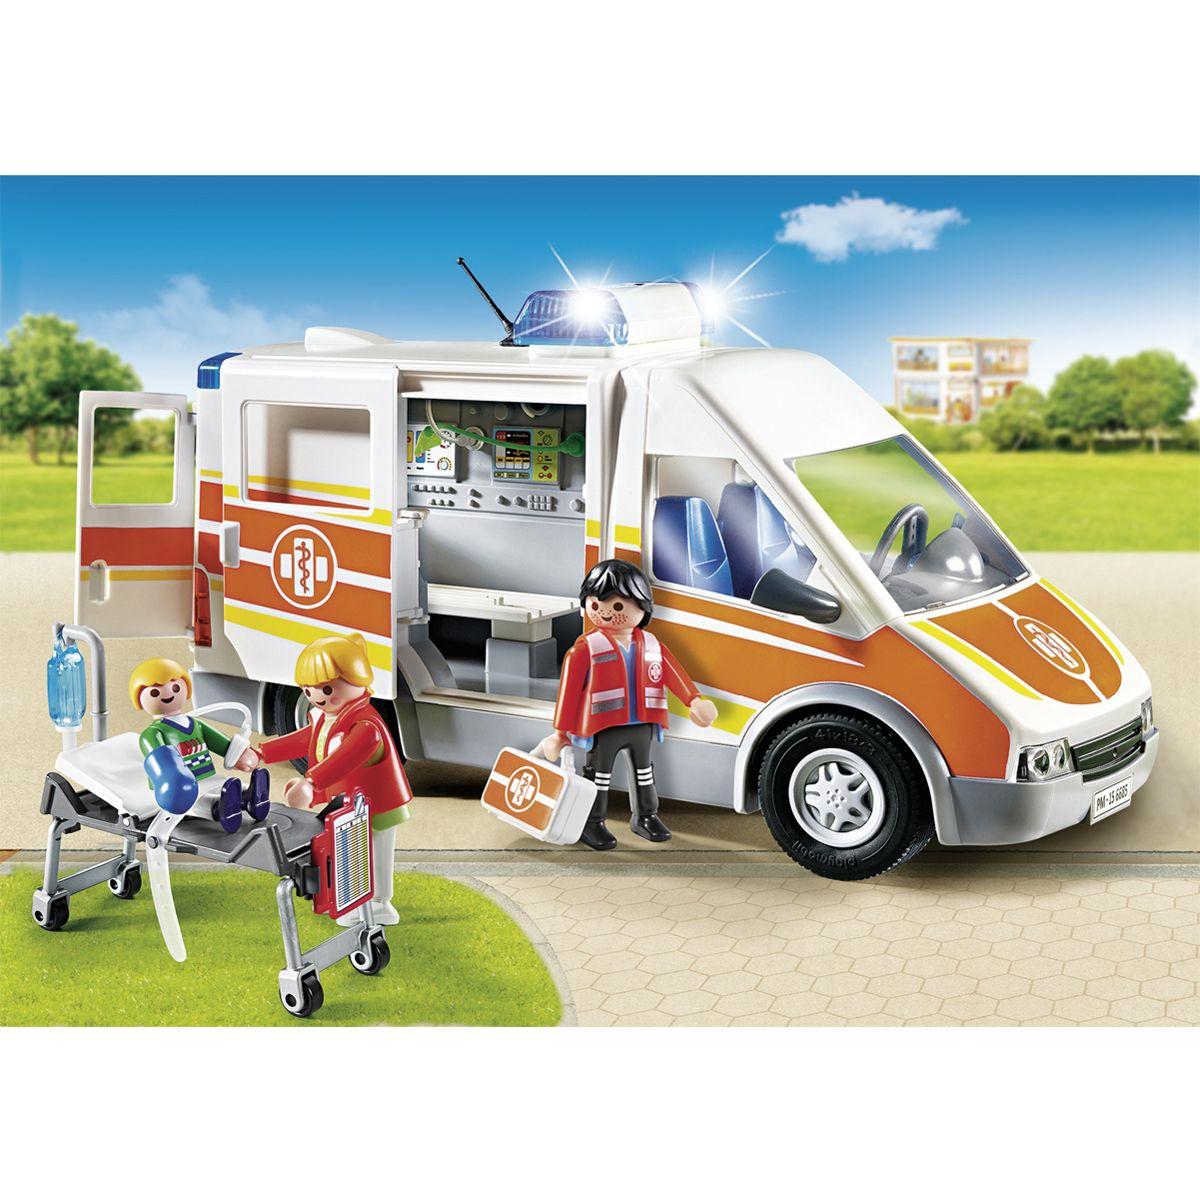 Ambulance City 6685 Avec Gyrophare Life Sirène Et La Playmobil rsthCQd